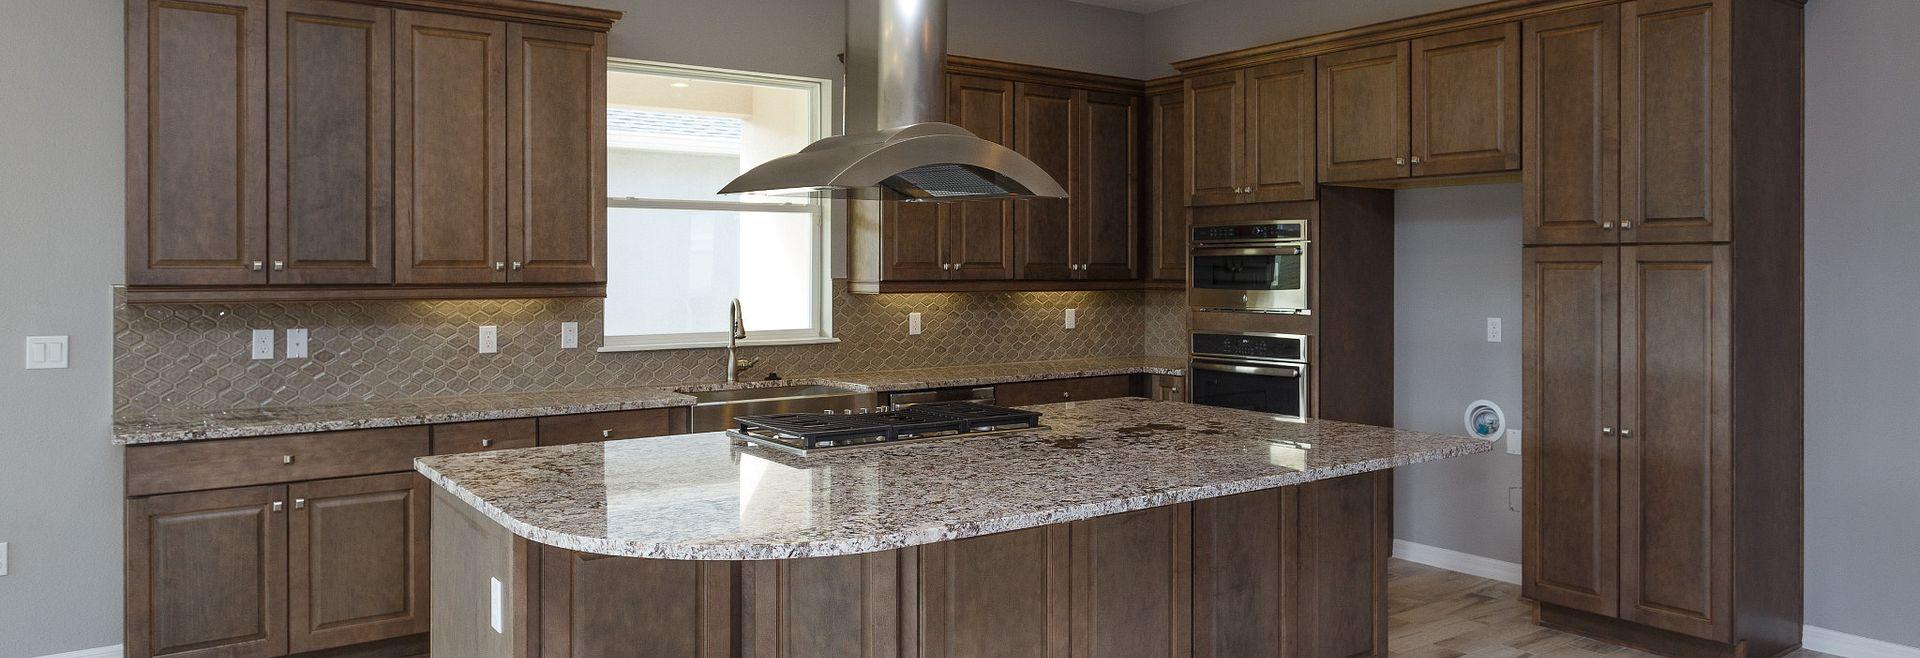 Trilogy Orlando Quick Move In Home Imagine Plan Kitchen